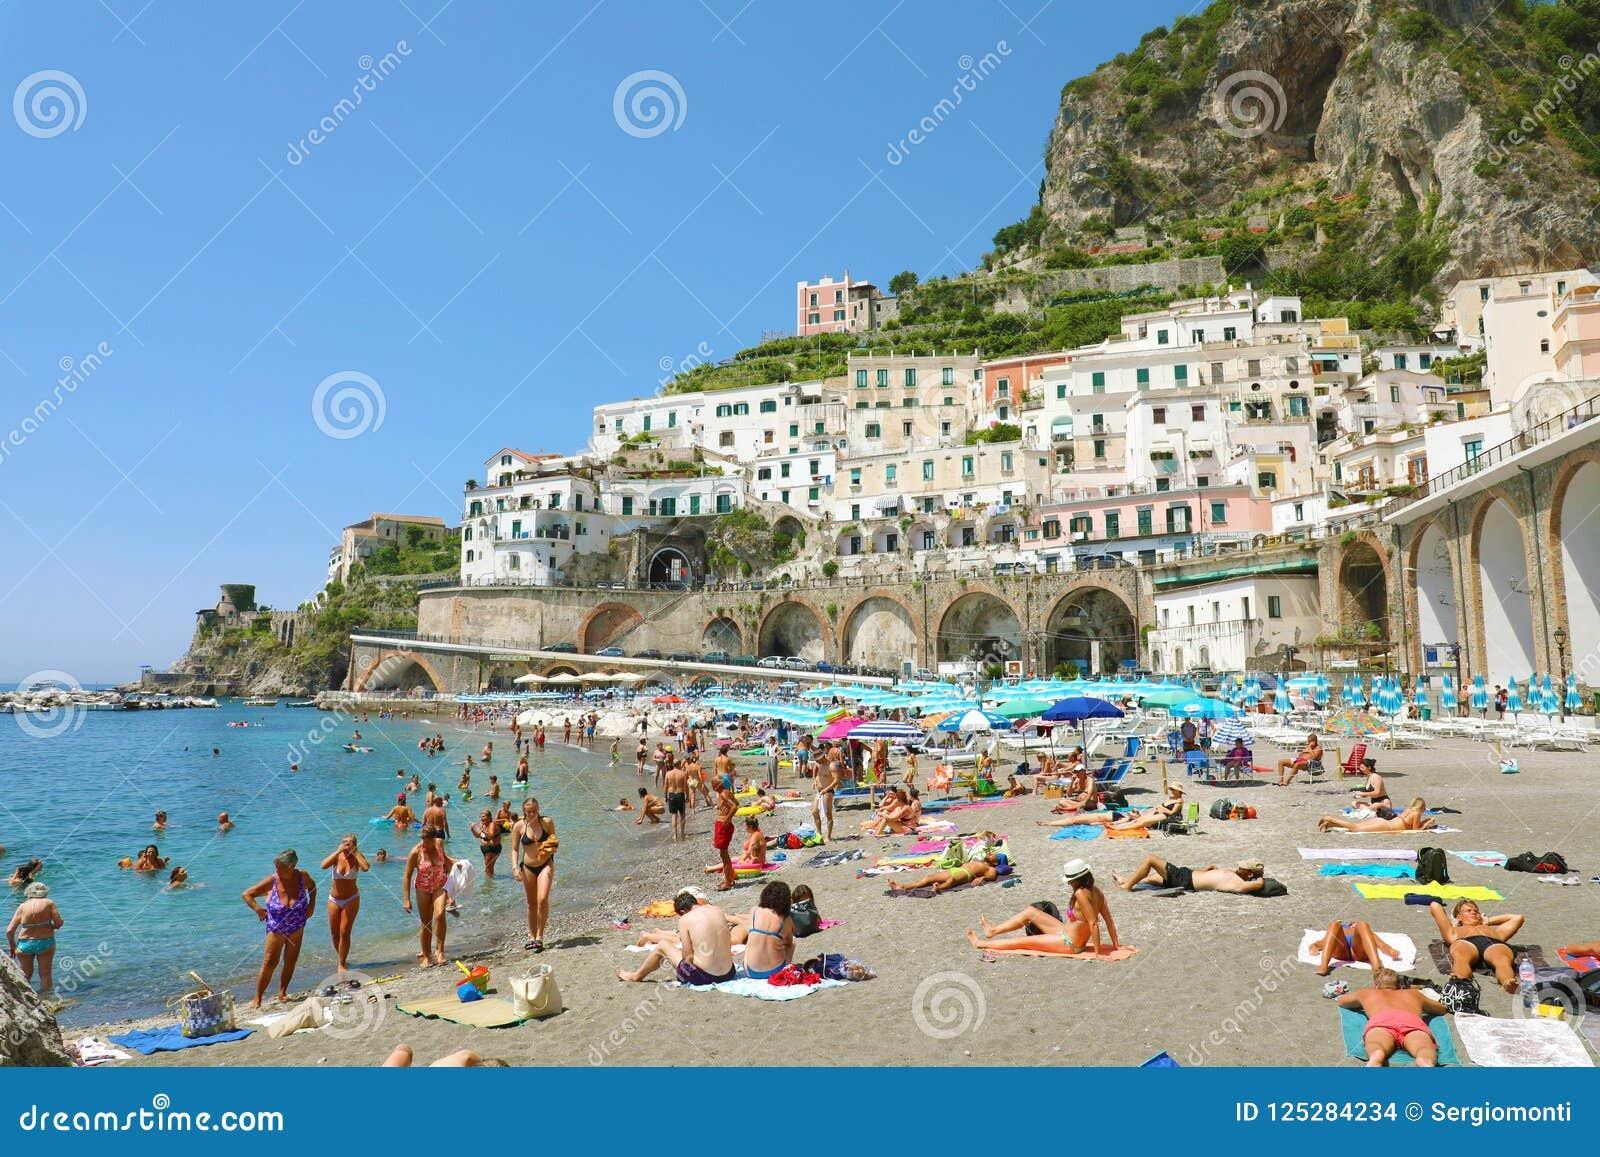 Atrani Italy July 2 2018 People On The Beach At Atrani